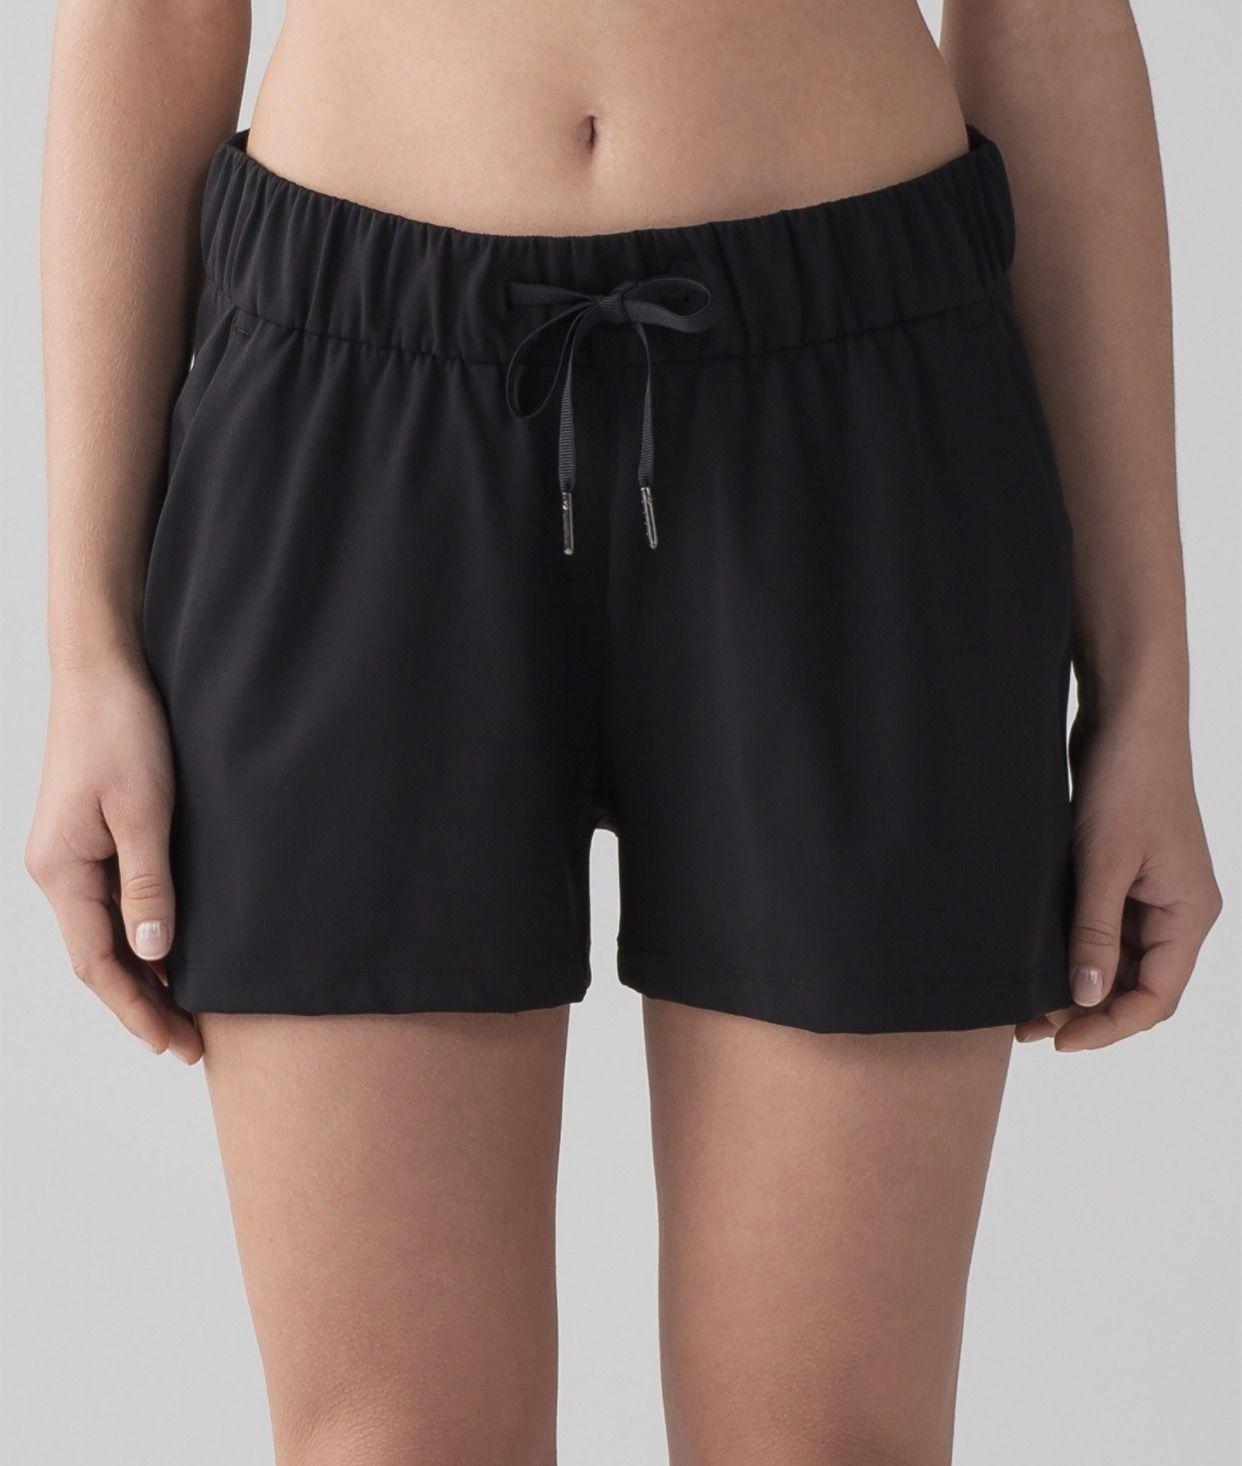 Black On The Fly Short Size 6 Womens Shorts Gym Shorts Womens Shorts [ 1466 x 1242 Pixel ]